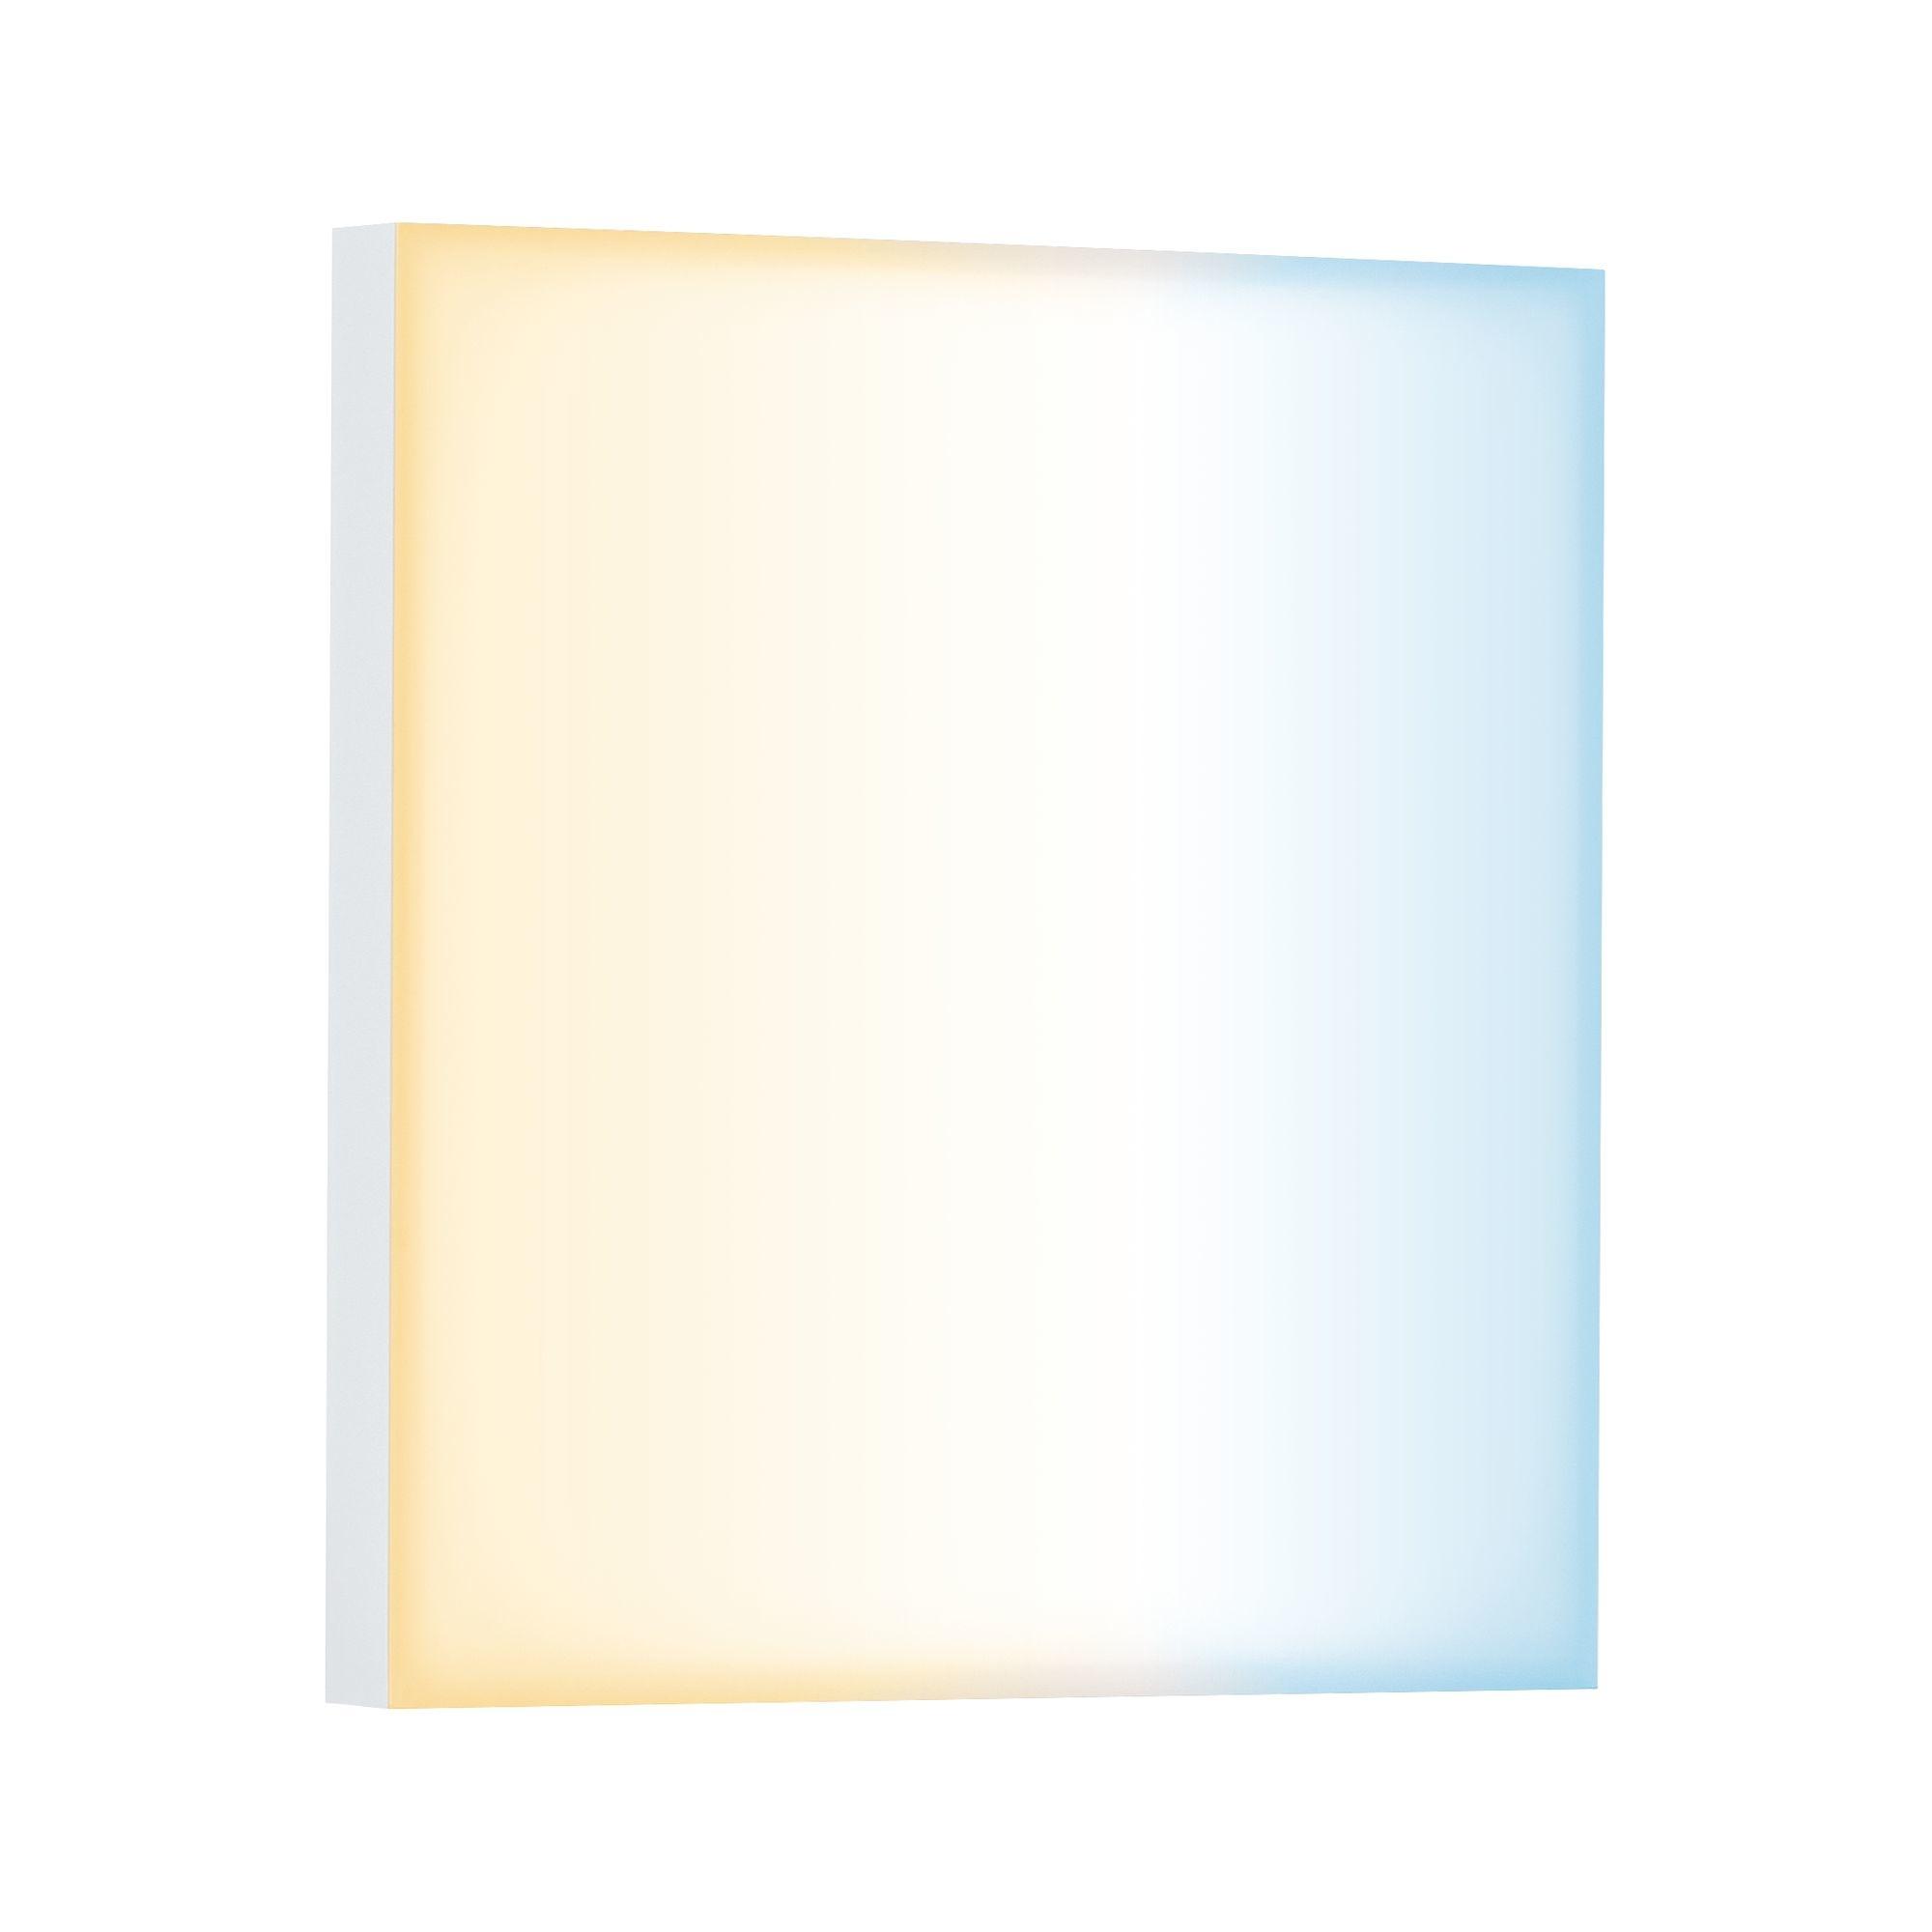 Paulmann  LED Panel Velora SmartHome Zigbee 225x225mm 8,5 W Weiß matt Tunable White